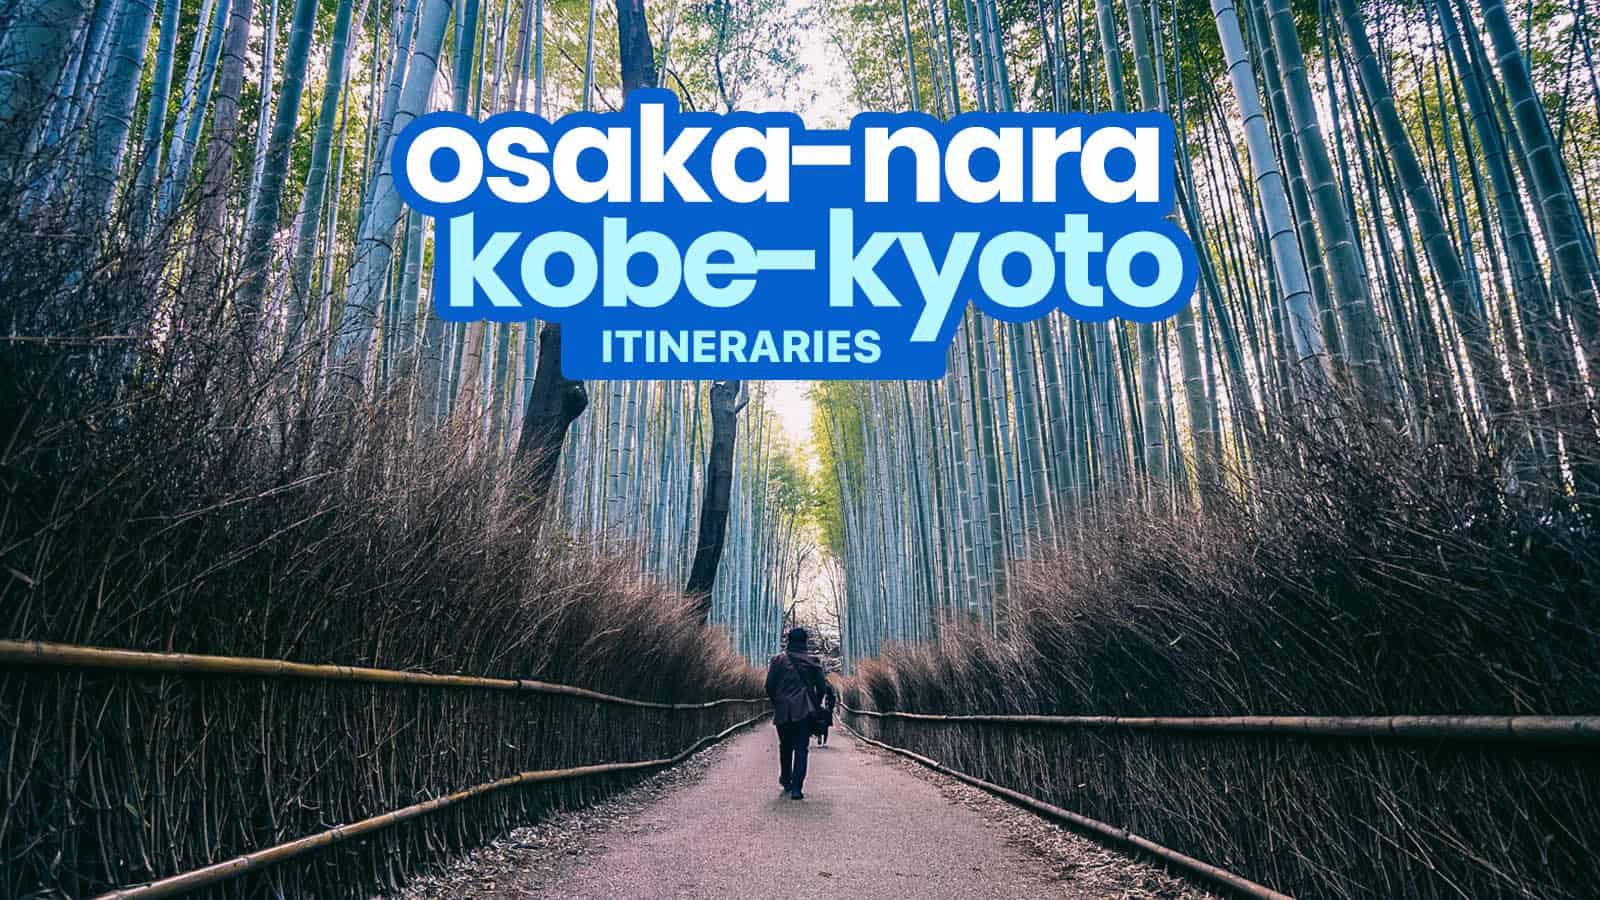 Sample OSAKA KYOTO NARA KOBE DIY Itinerary 4 5 6 Days The 1600x900